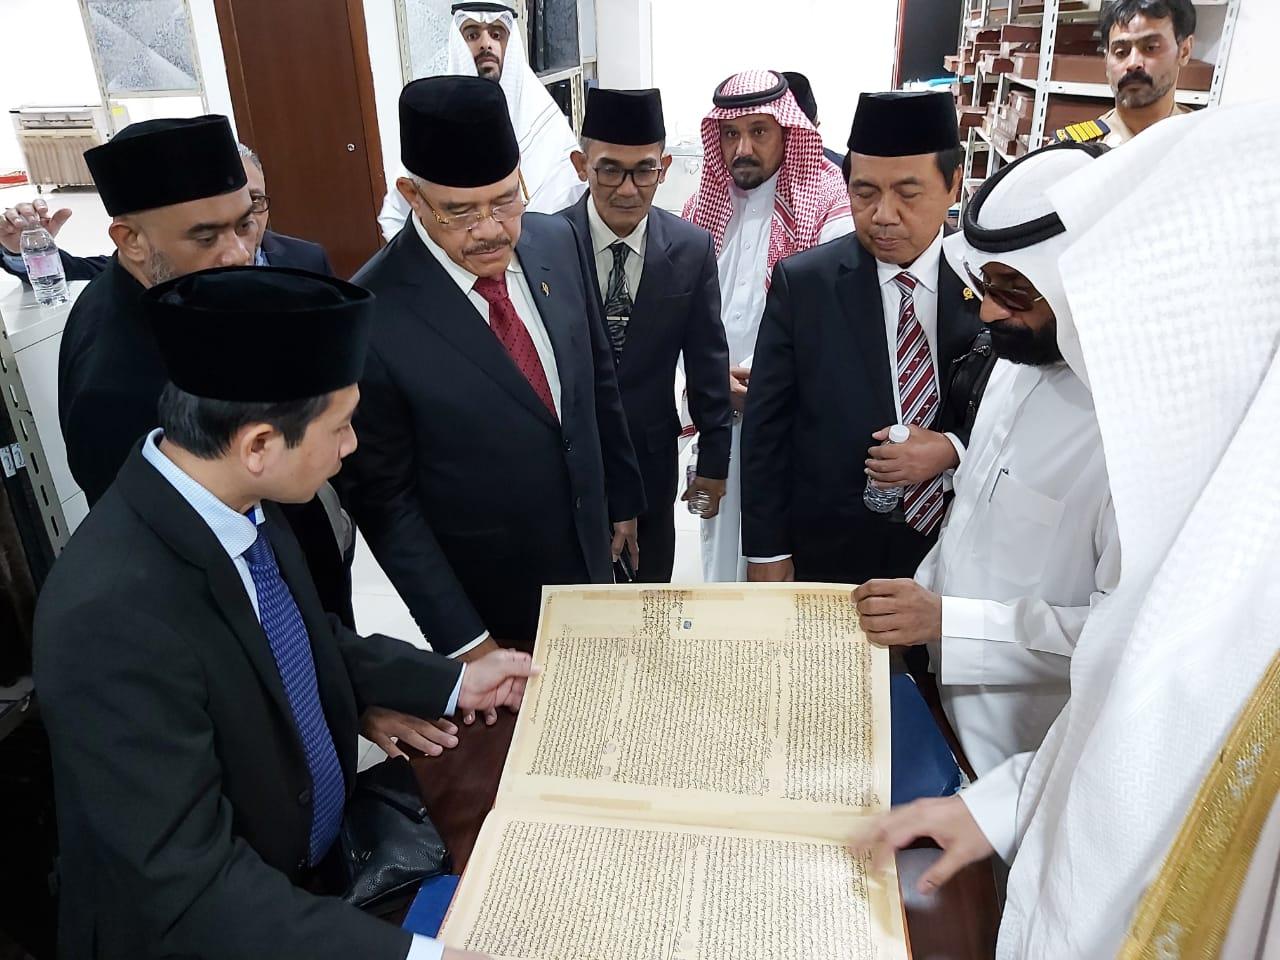 DELEGASI MAHKAMAH AGUNG REPUBLIK INDONESIA KUNJUNGI PENGADILAN UMUM  (MAHKAMAH AL-AMMAH) MAKKAH